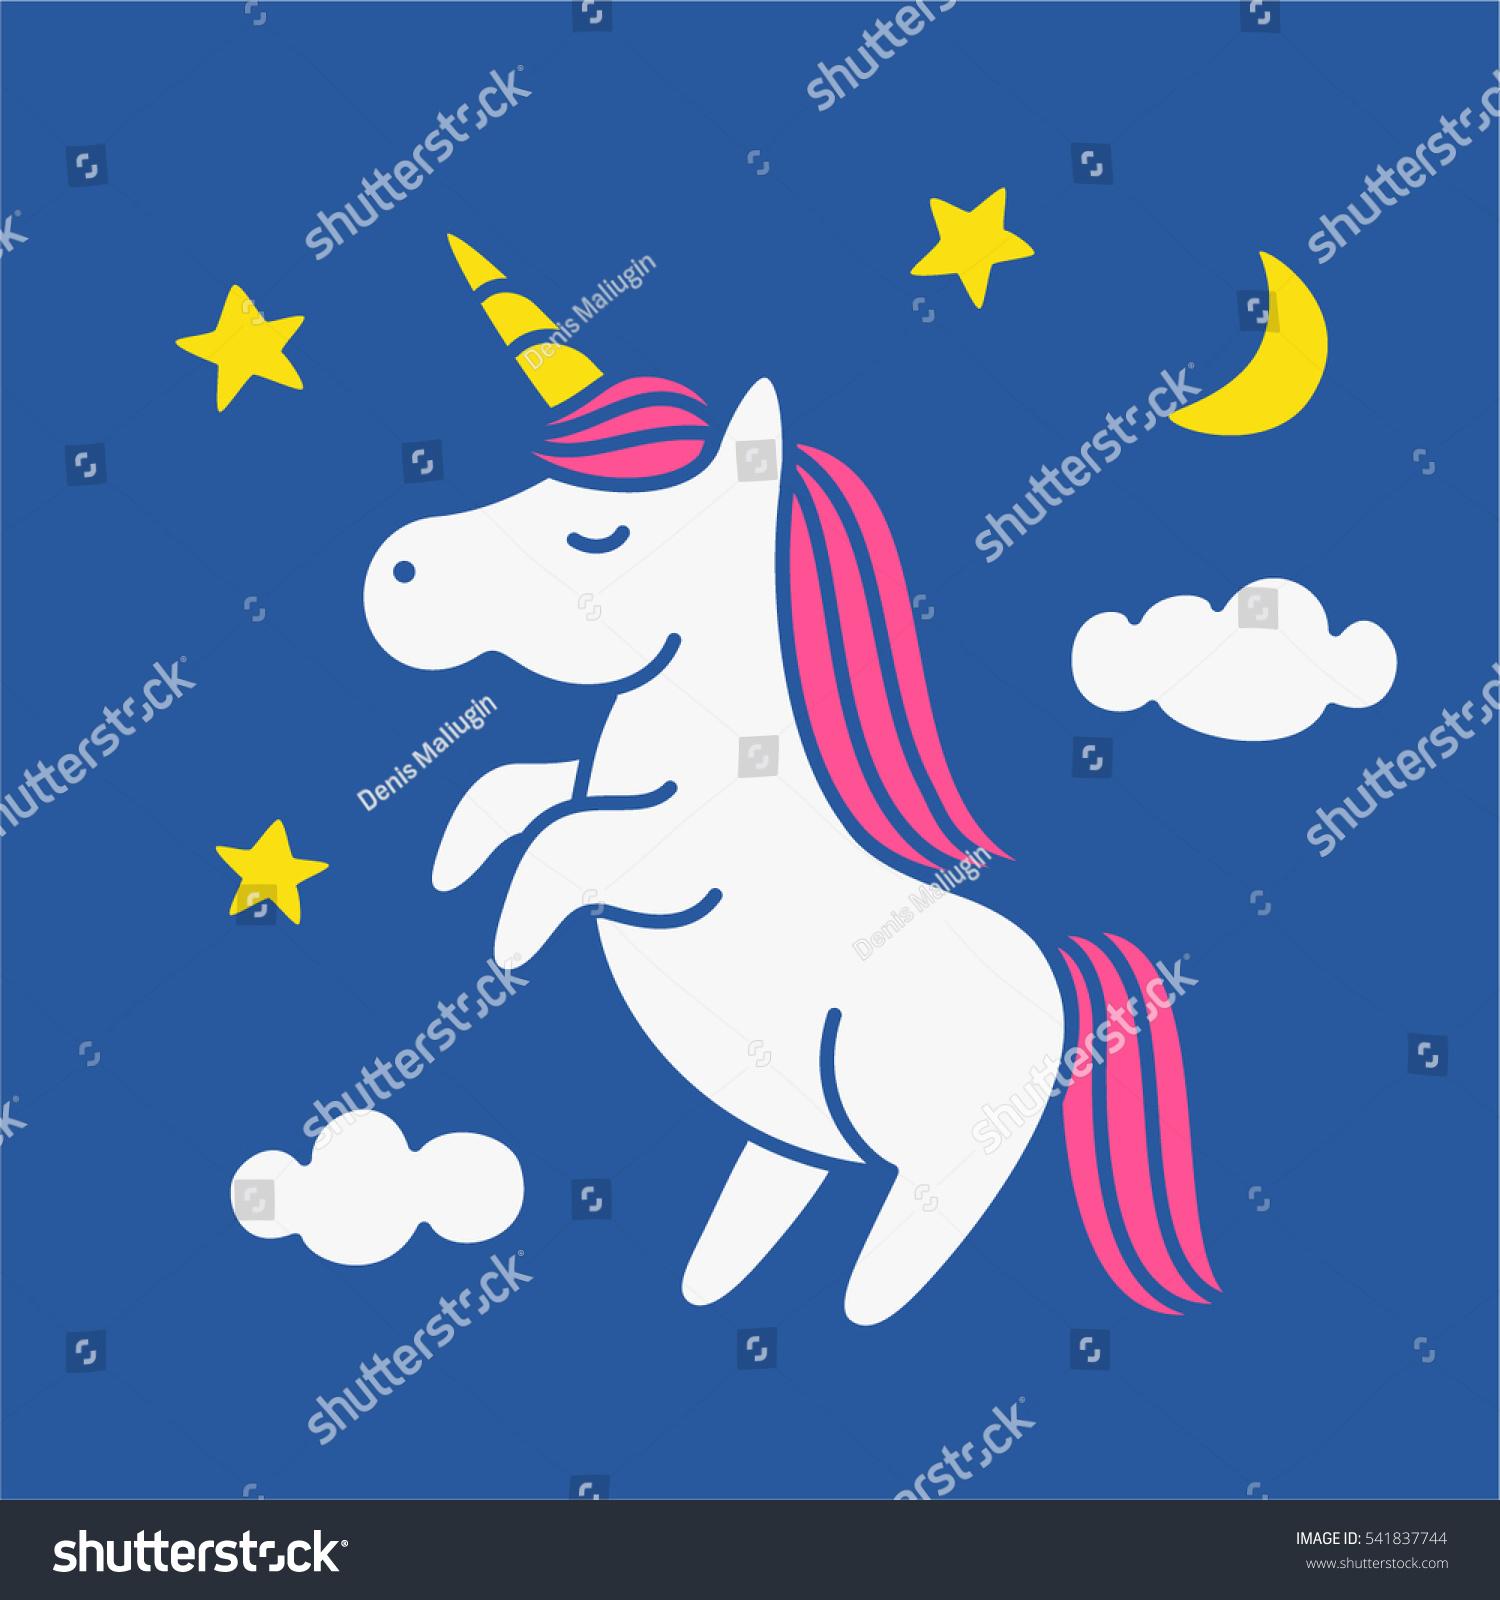 cute magic unicorn on night sky stock vector royalty free rh shutterstock com night sky vector wallpaper free night sky vector illustration